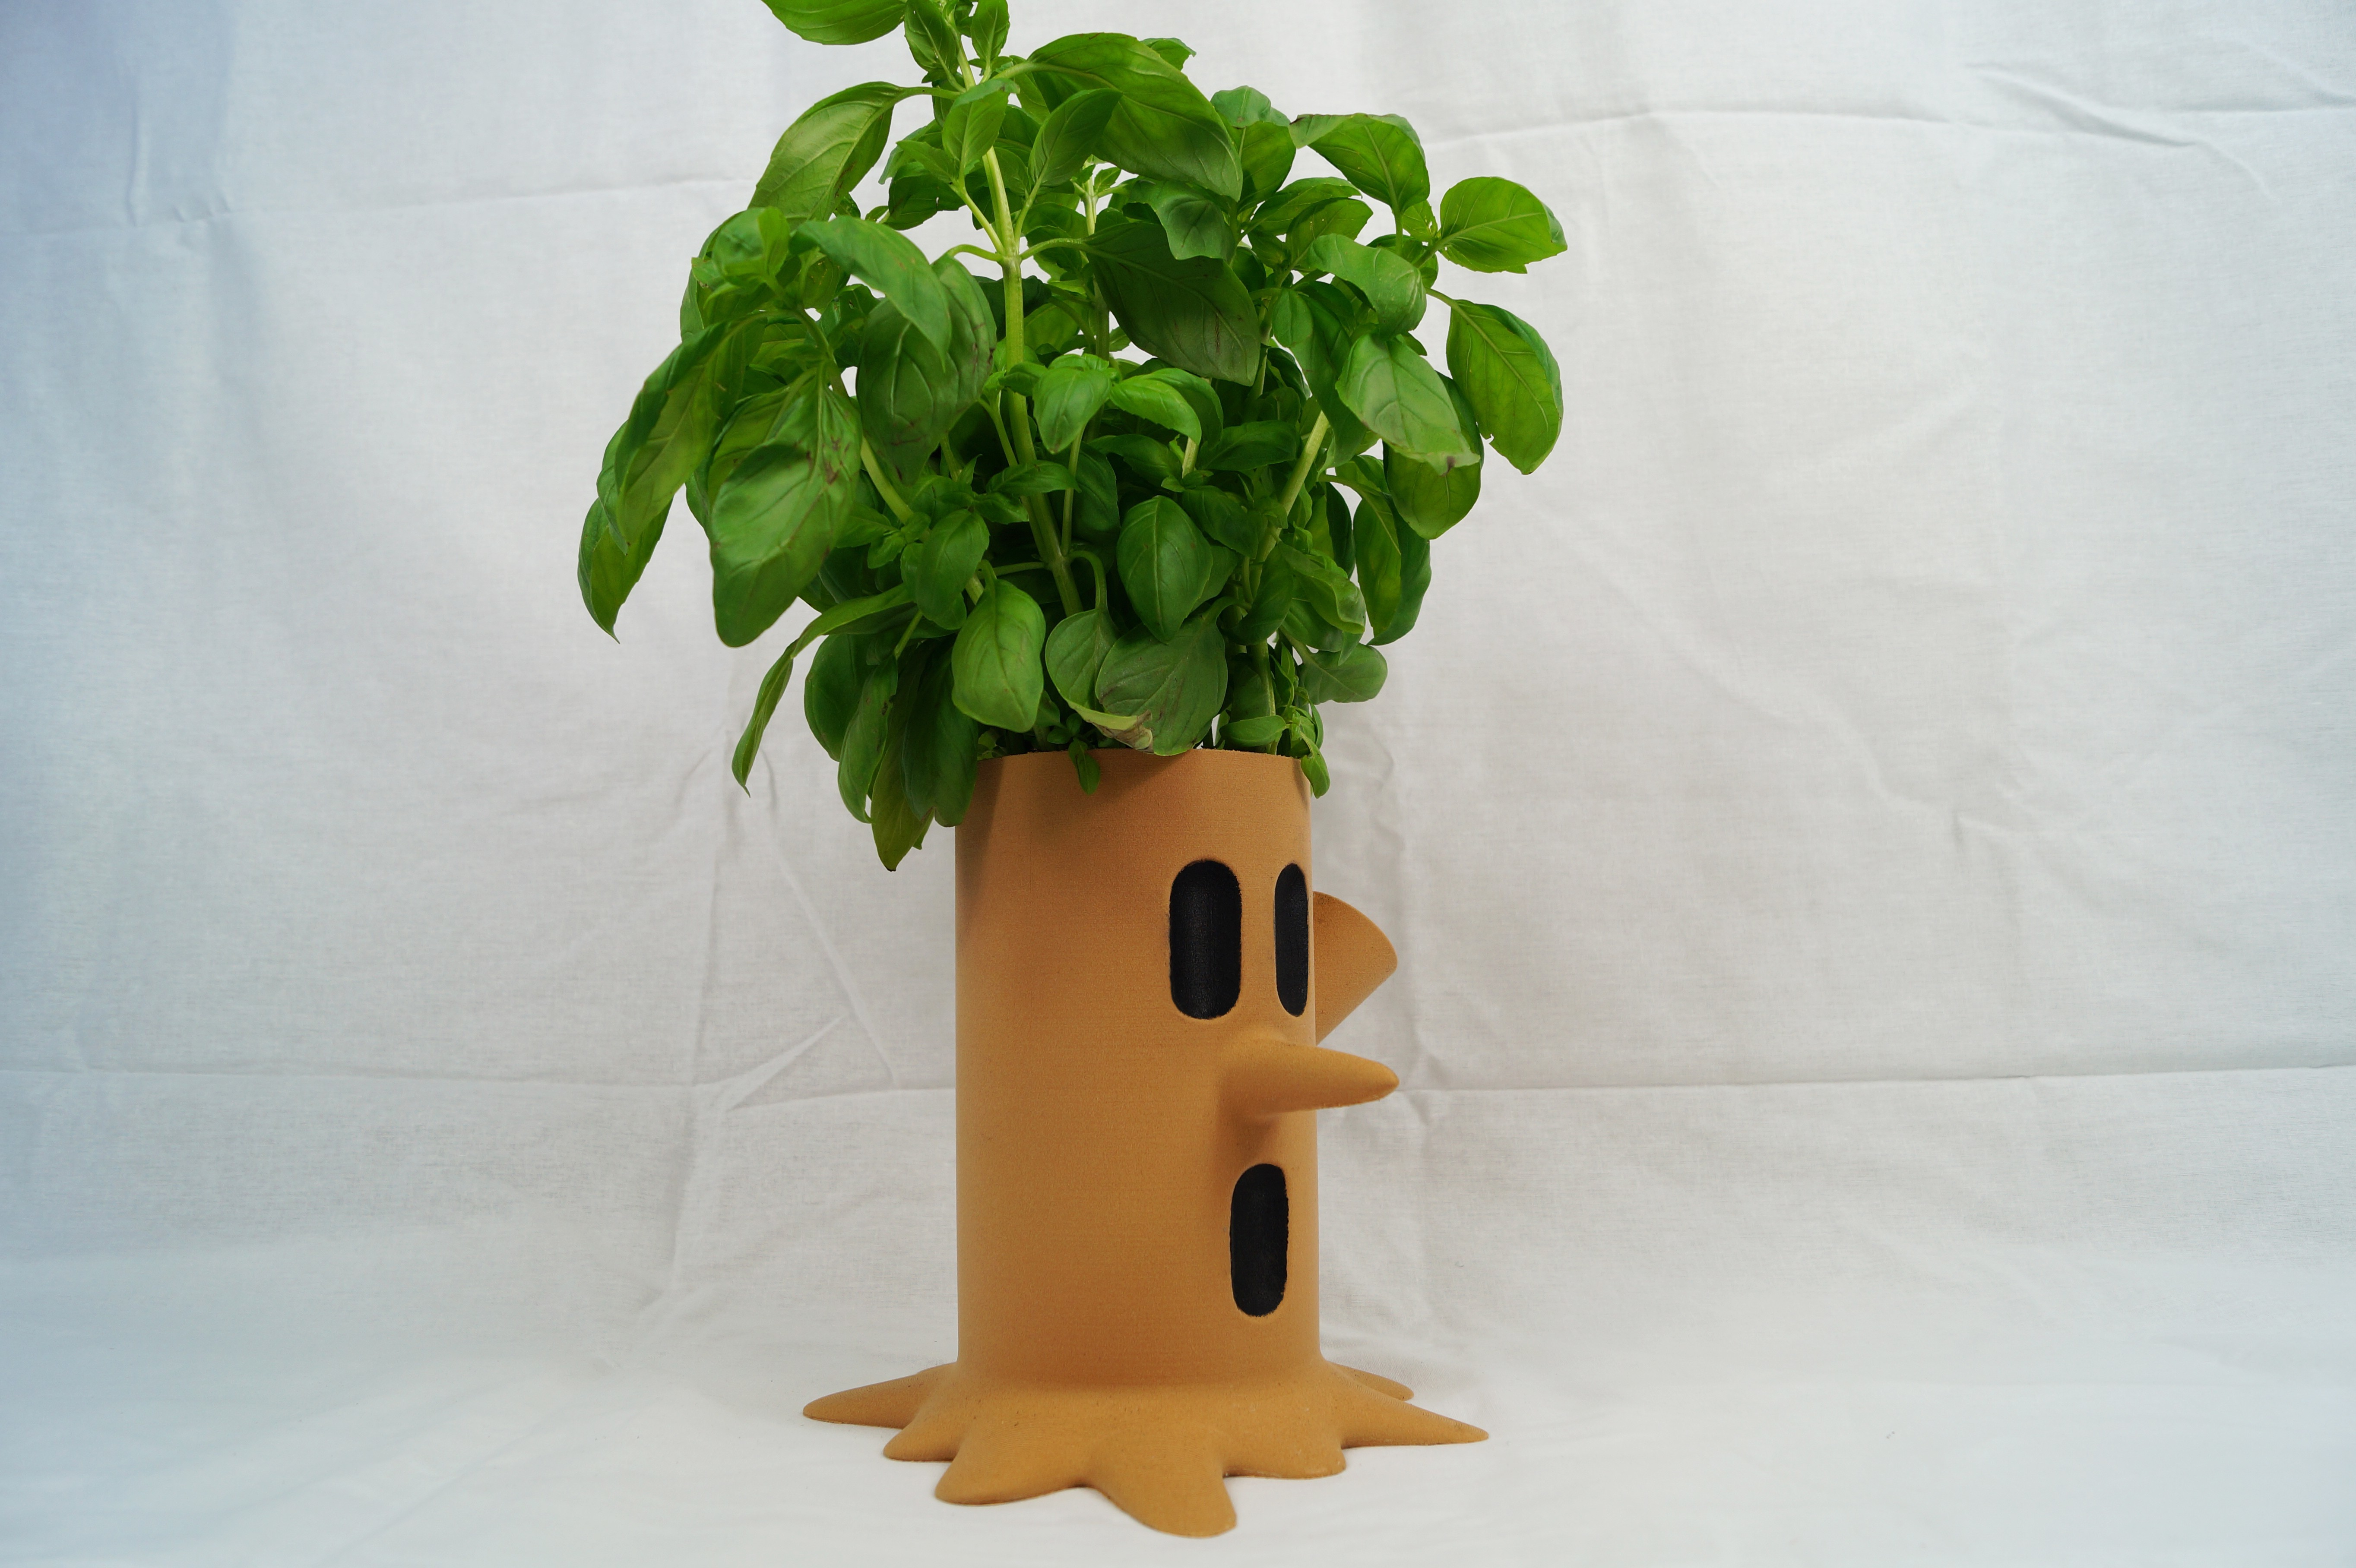 DSC09807 copy.jpg Download free STL file Kirby Whispy Woods Plant Pot • 3D printing design, HD3DP